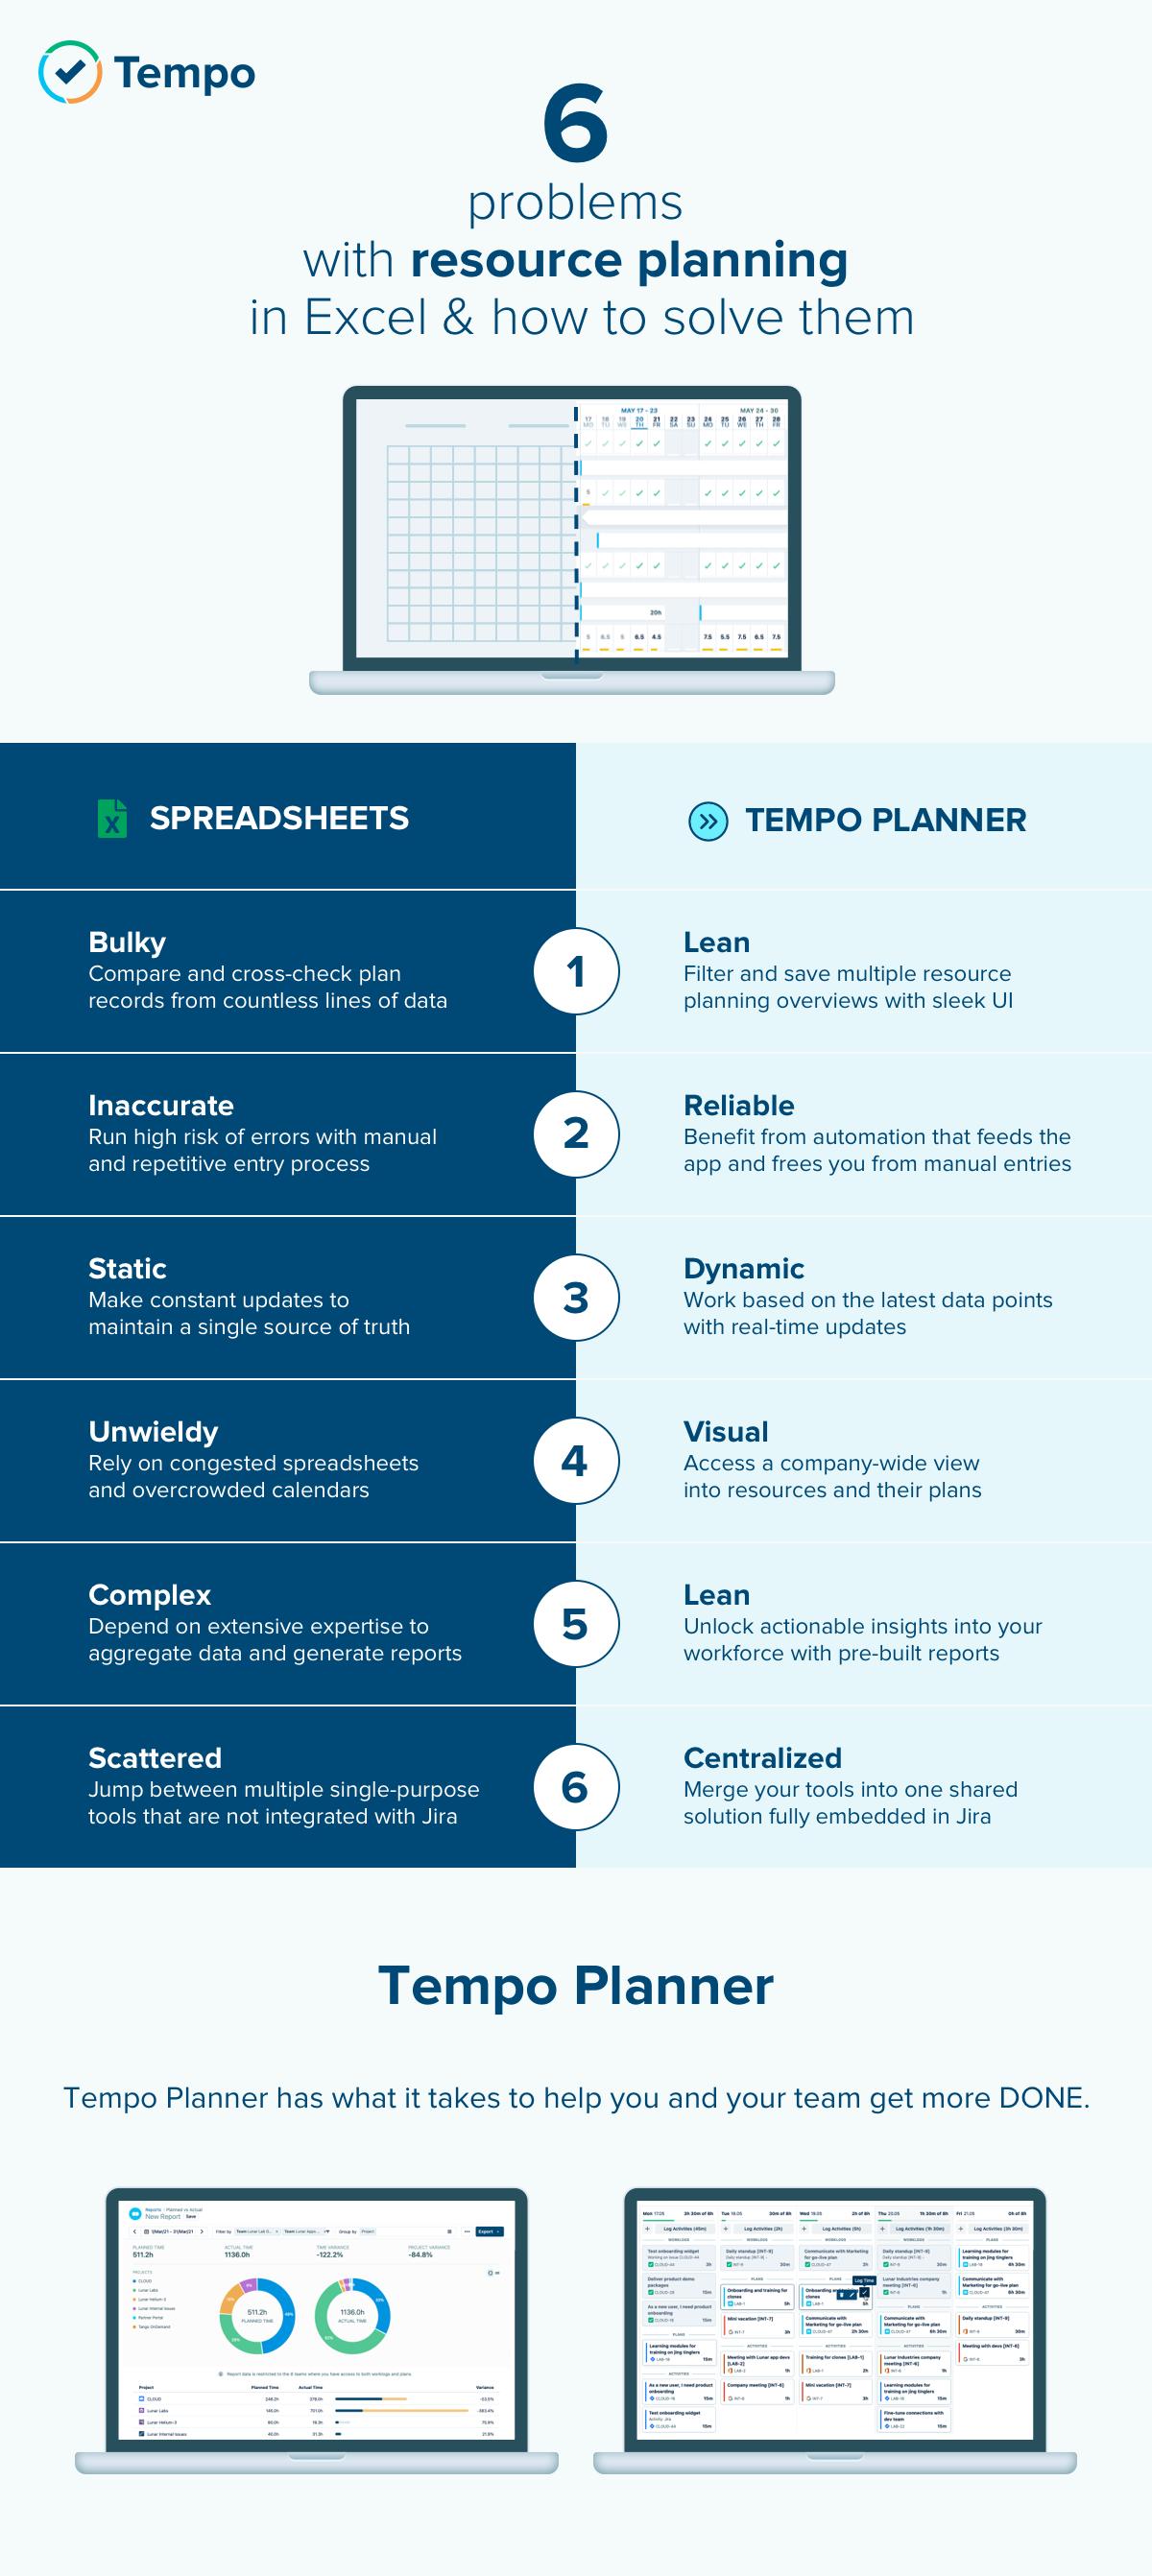 Tempo Planner - Excel spreadsheet alternative infographic